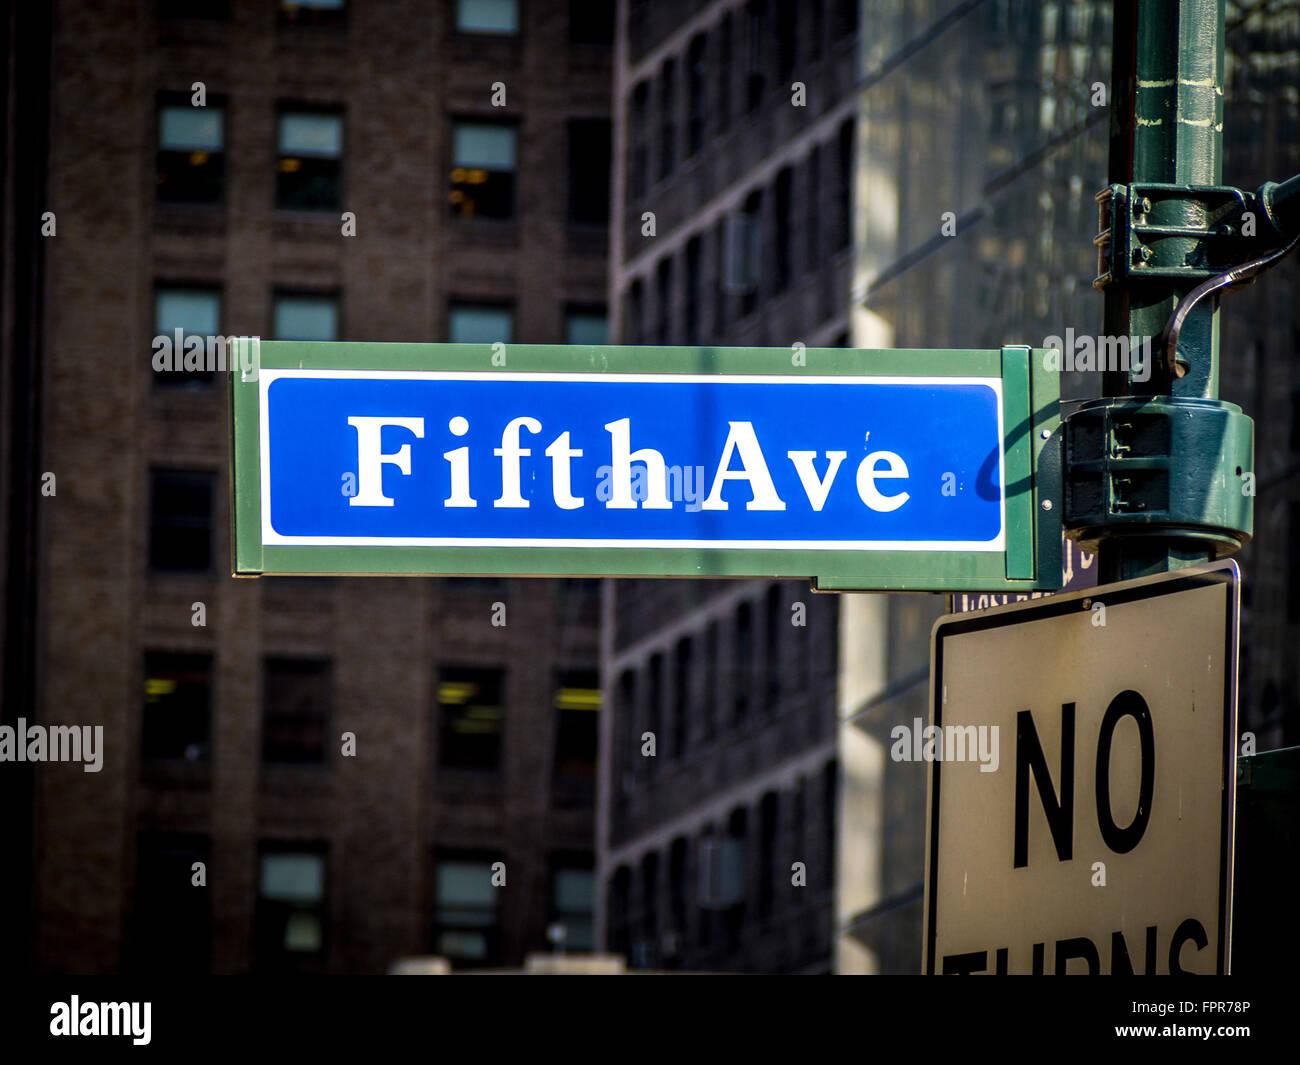 5th Avenue sign, New York, USA. - Stock Image